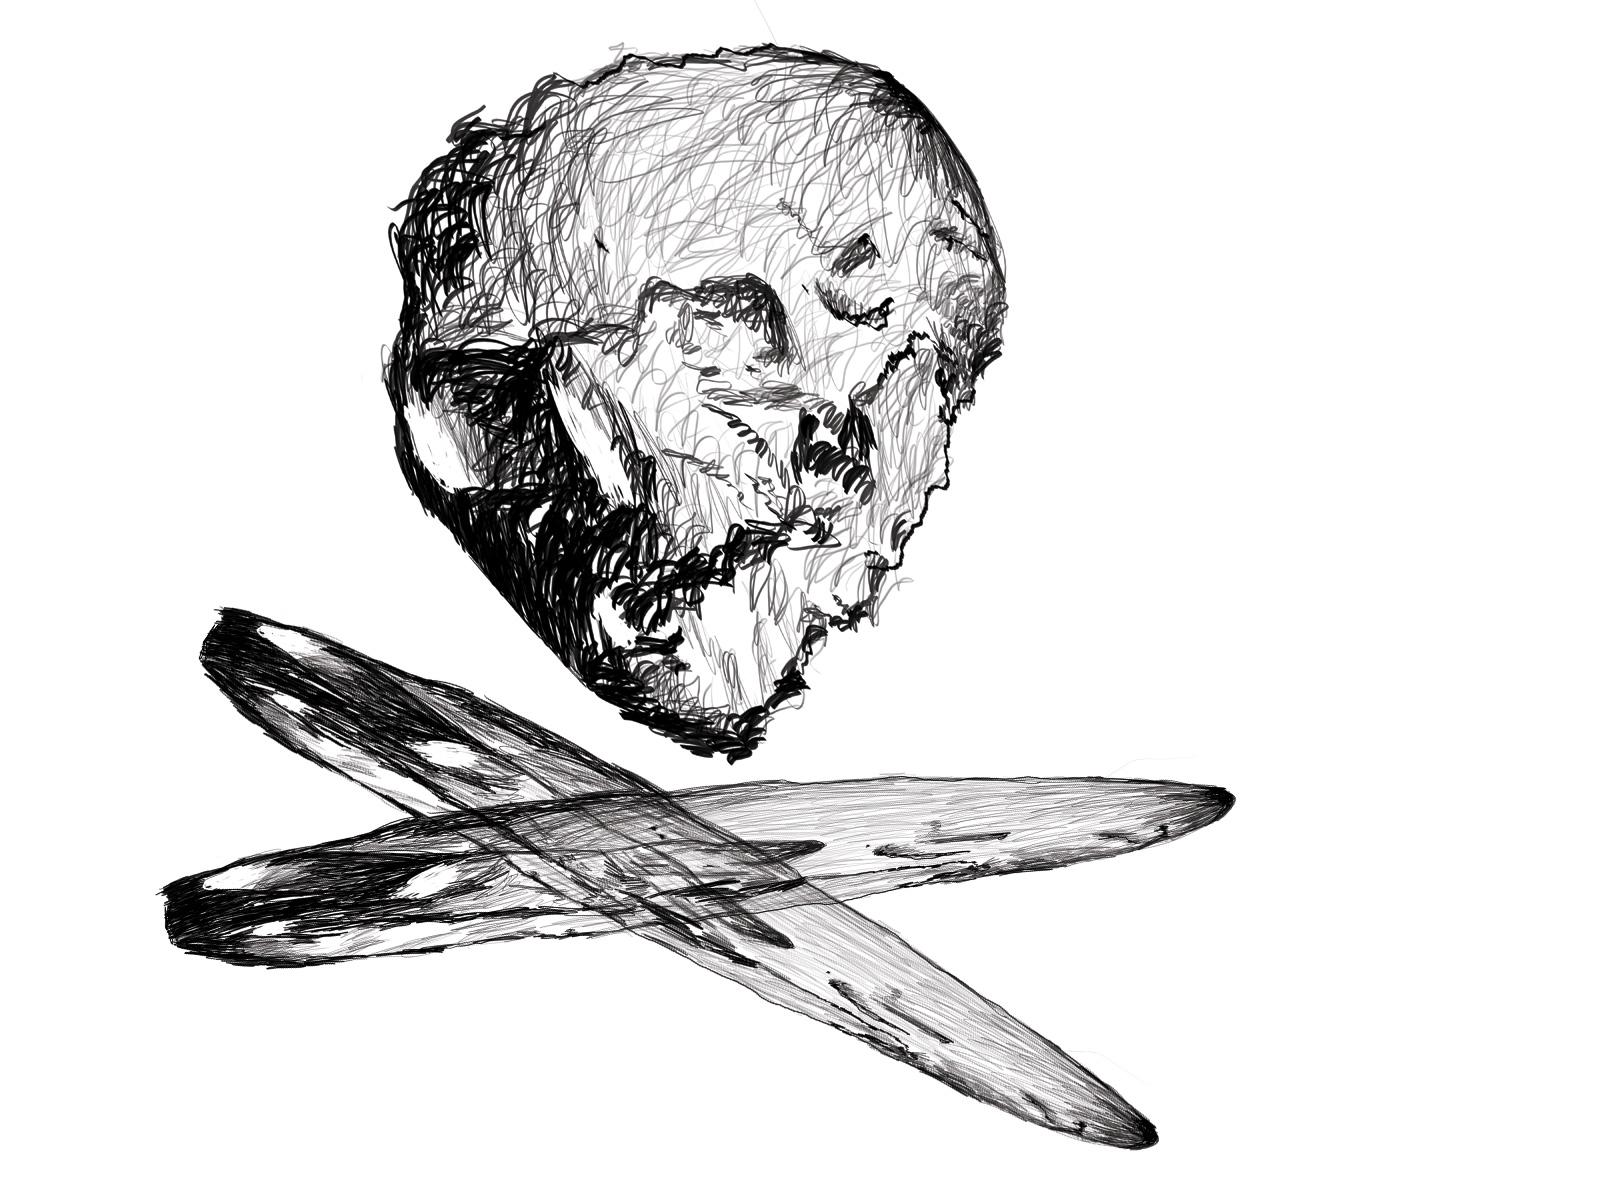 The Ambassadors' Skull